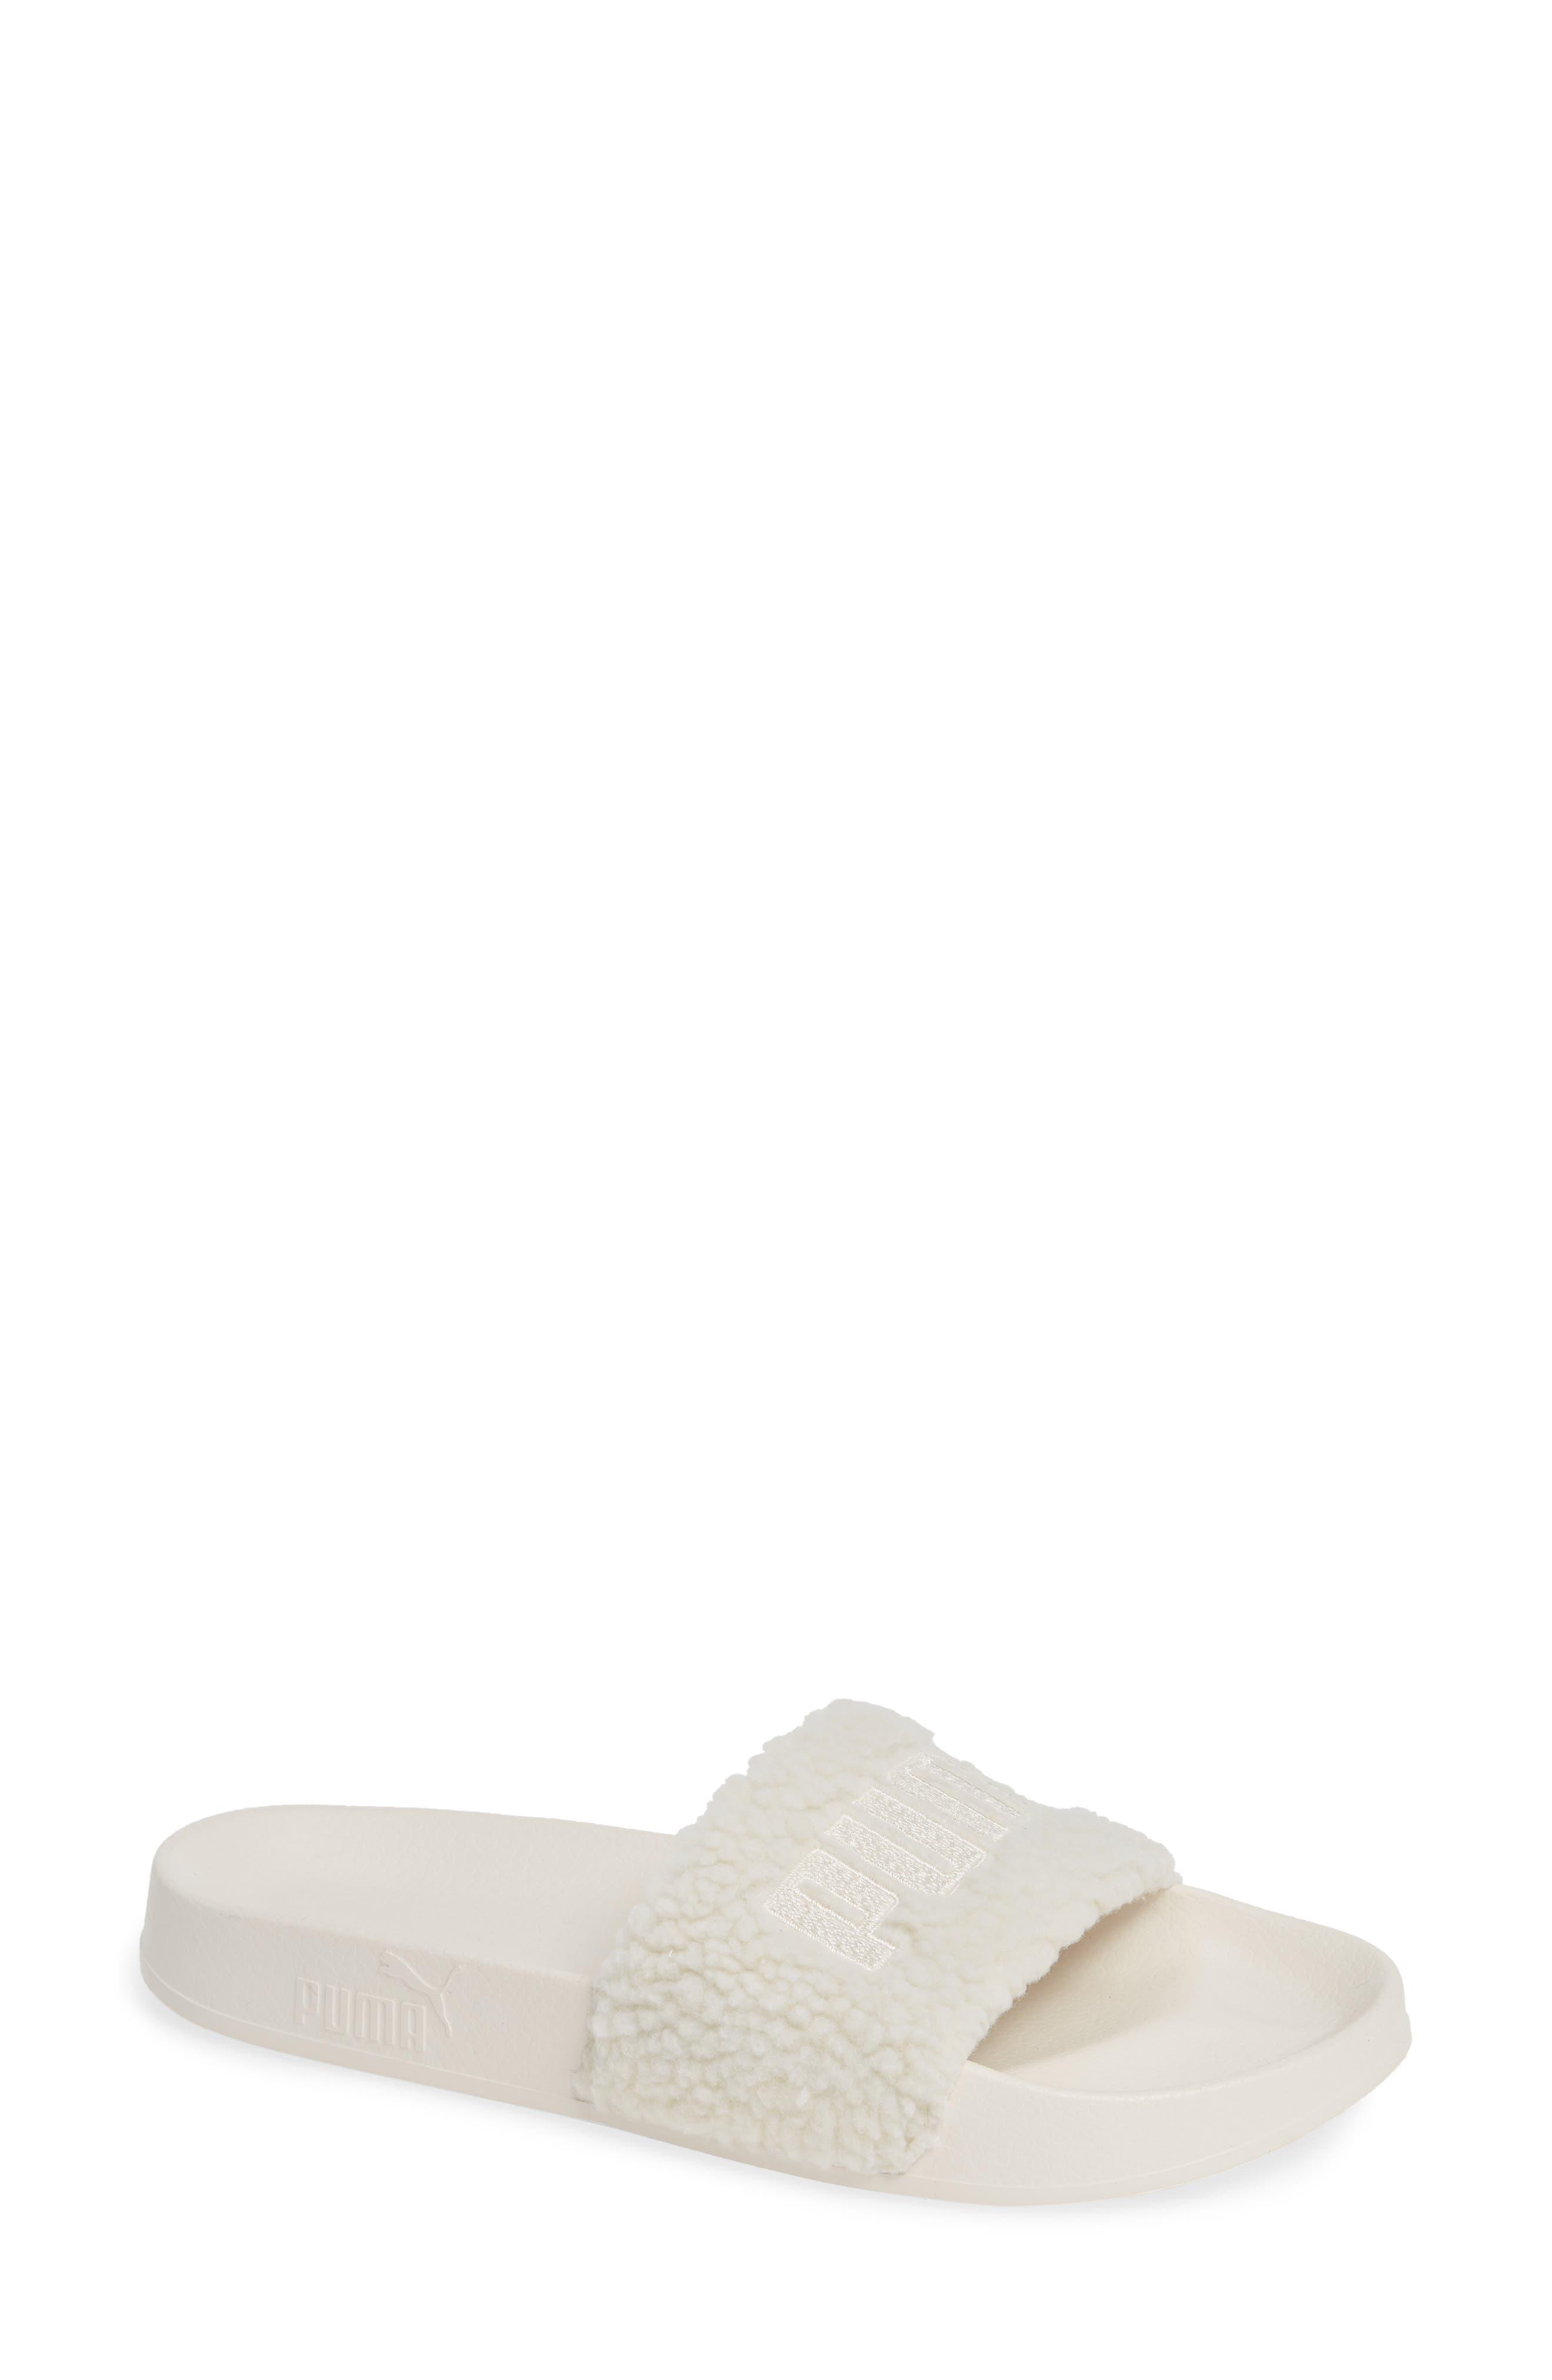 Leadcat Faux Shearling Slide Sandal,                         Main,                         color, WHISPER WHITE